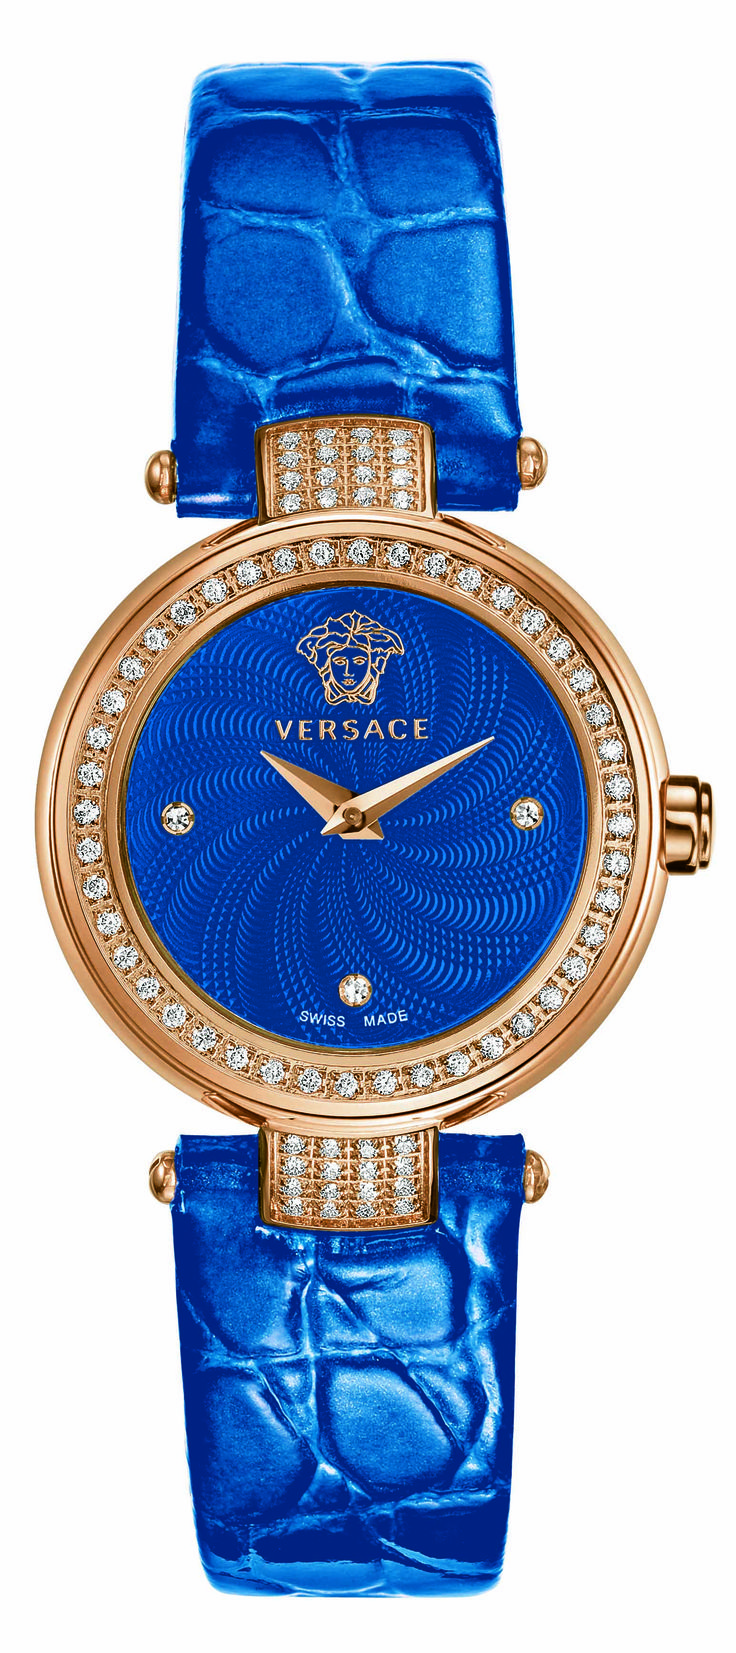 Versace Mystique Small.. love the blue